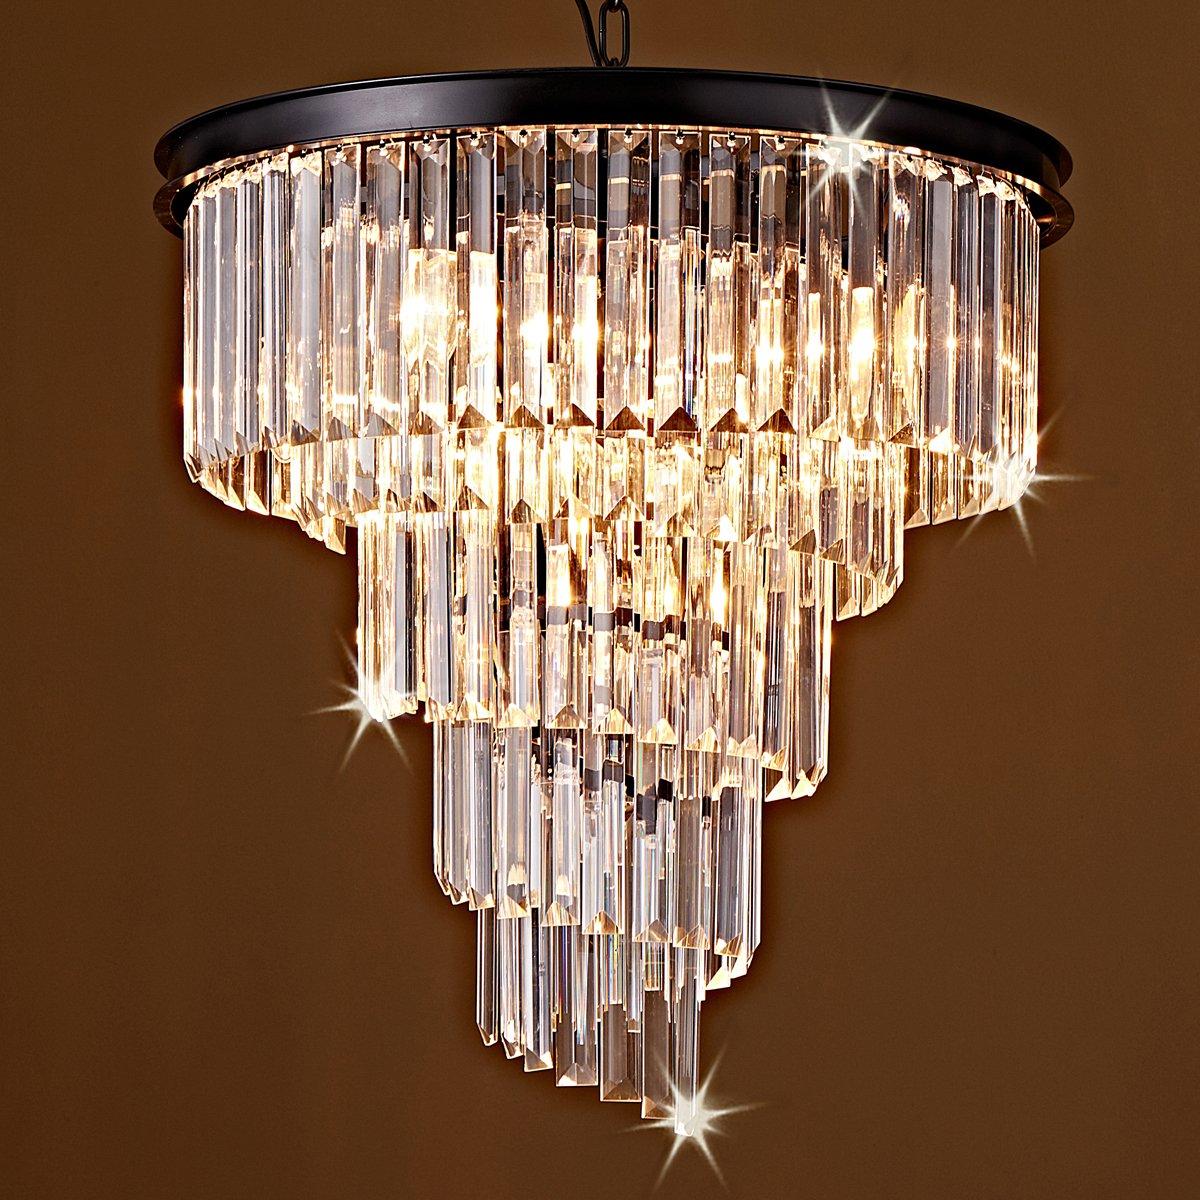 Saint Mossi Modern K9 CrystalBar Lantern-shaped Raindrop Chandelier Lighting Flush mount LED Ceiling Light Fixture Pendant Lamp for Dining Room Bathroom Bedroom Livingroom 9 E12 Bulbs Required H20 D20 by Saint Mossi